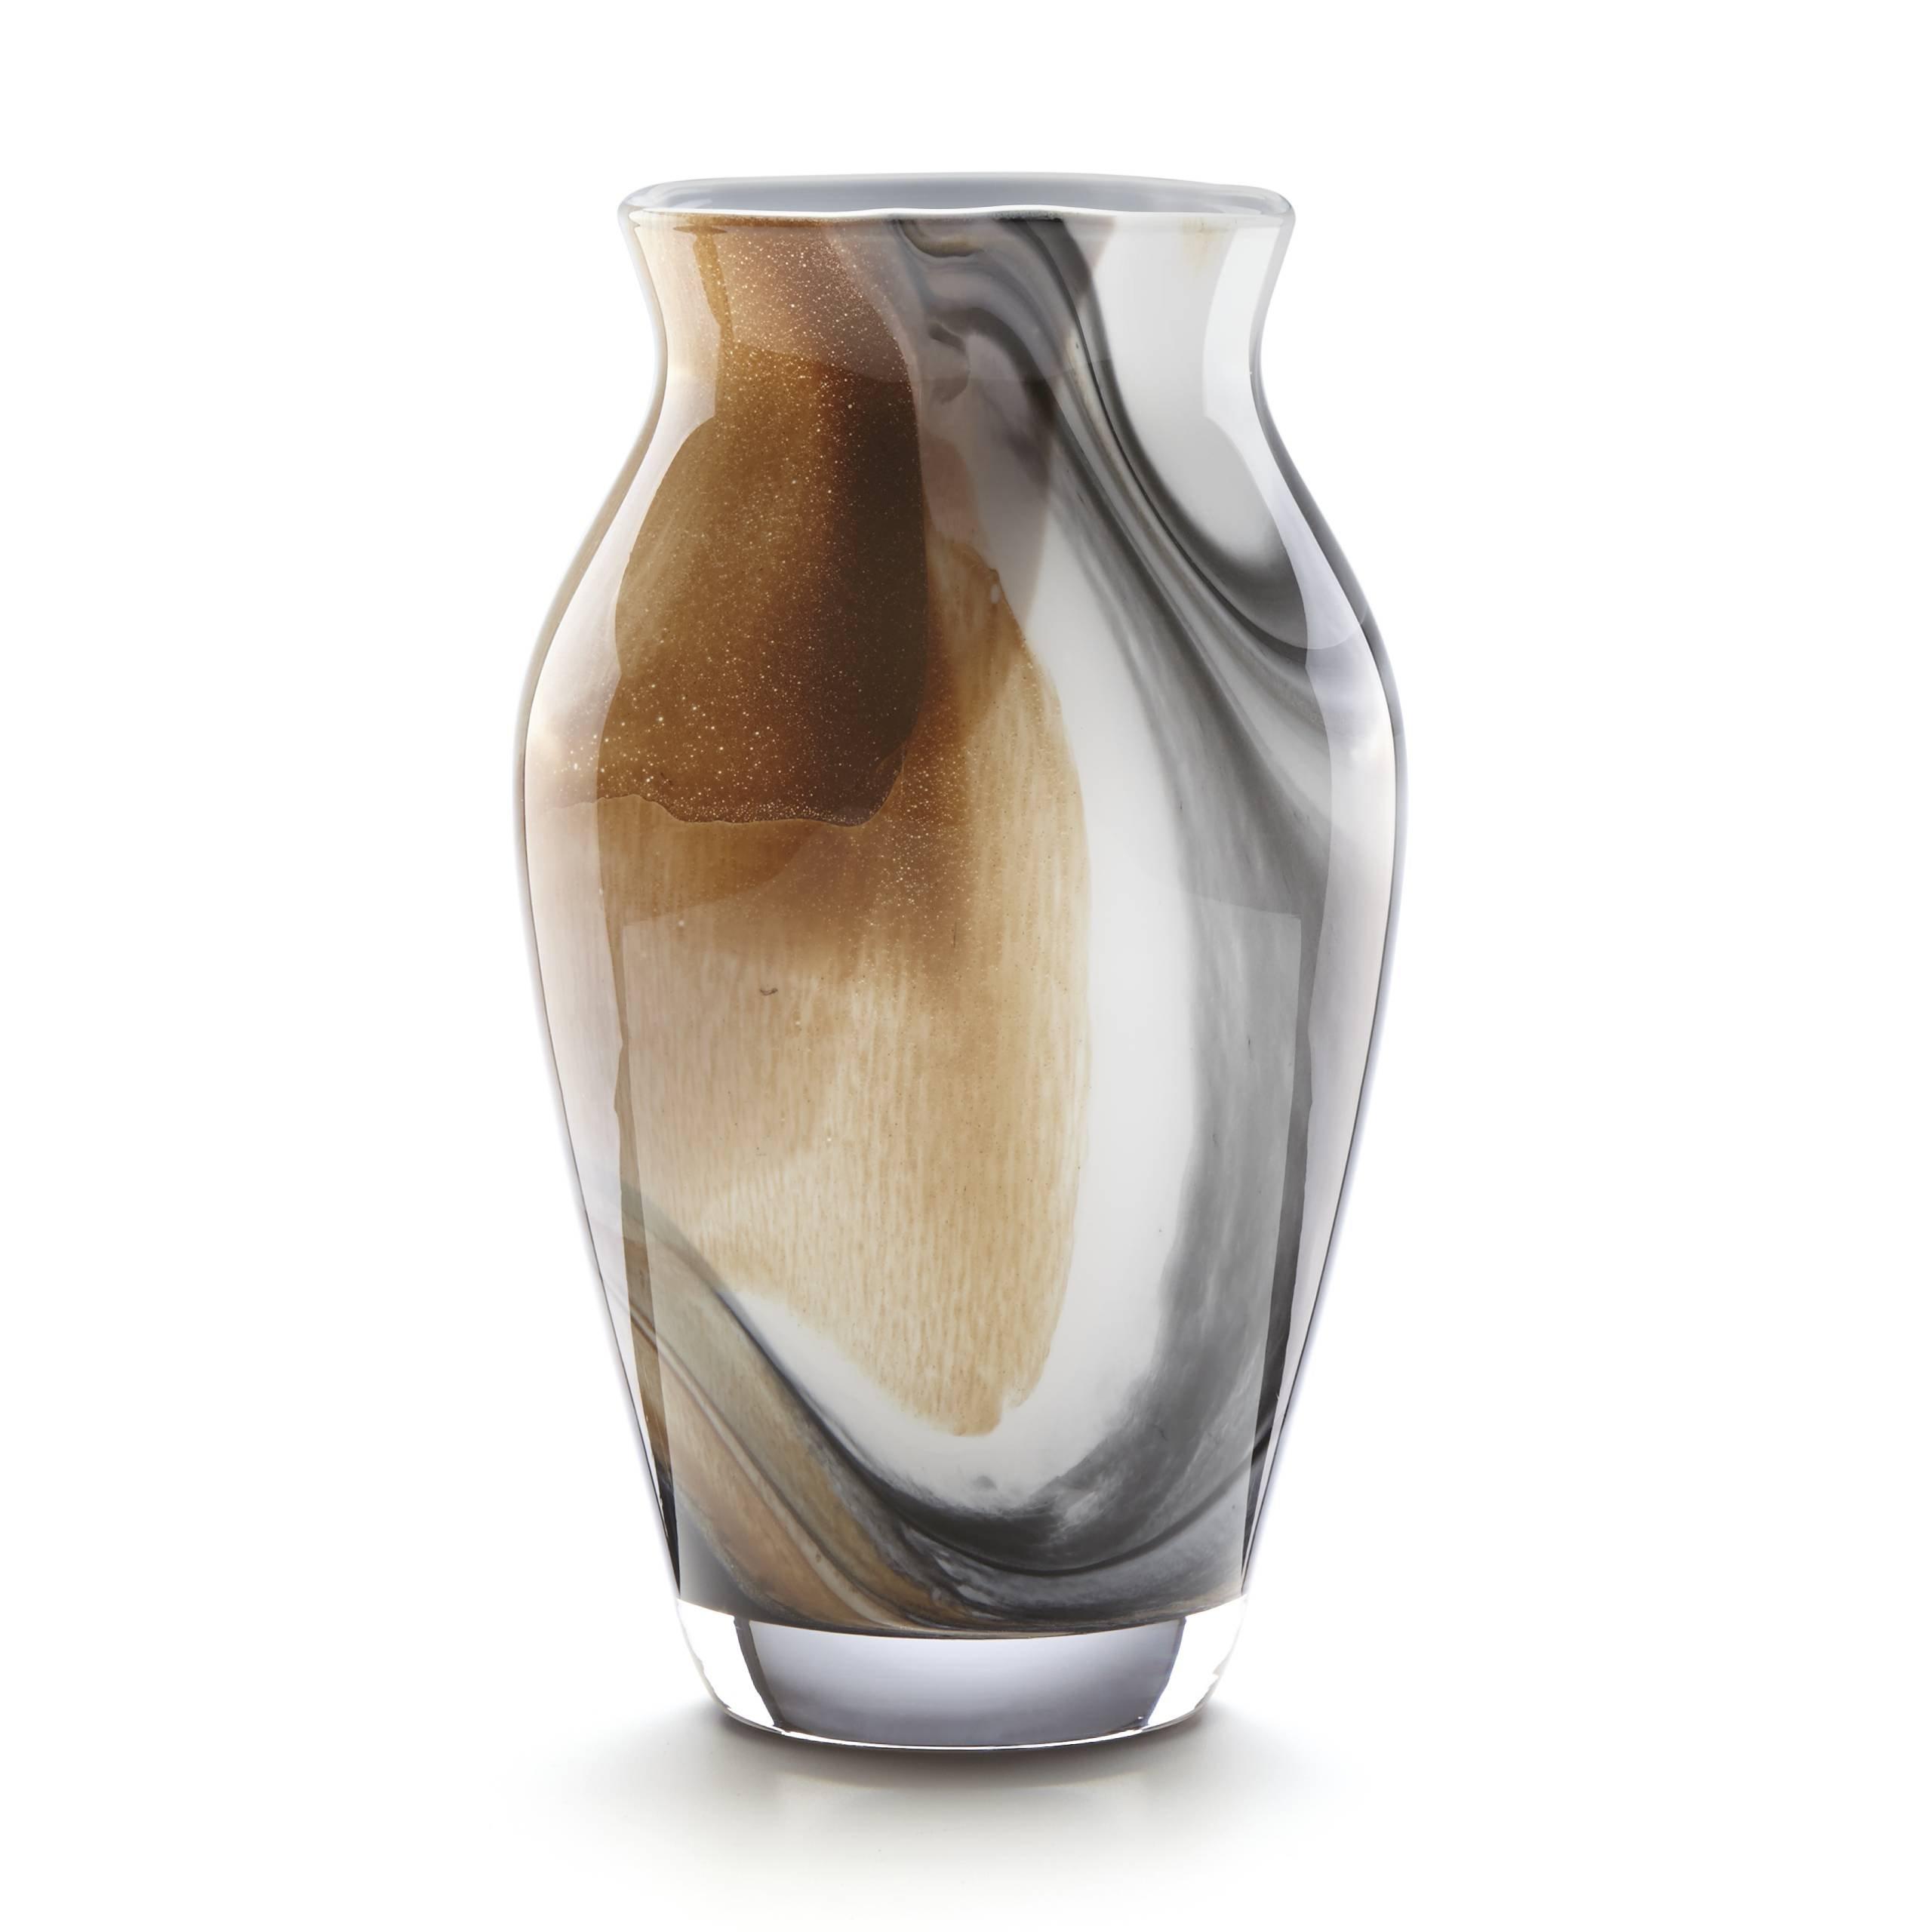 Lenox Seaview Sand Tulip Vase - 871430 by Lenox